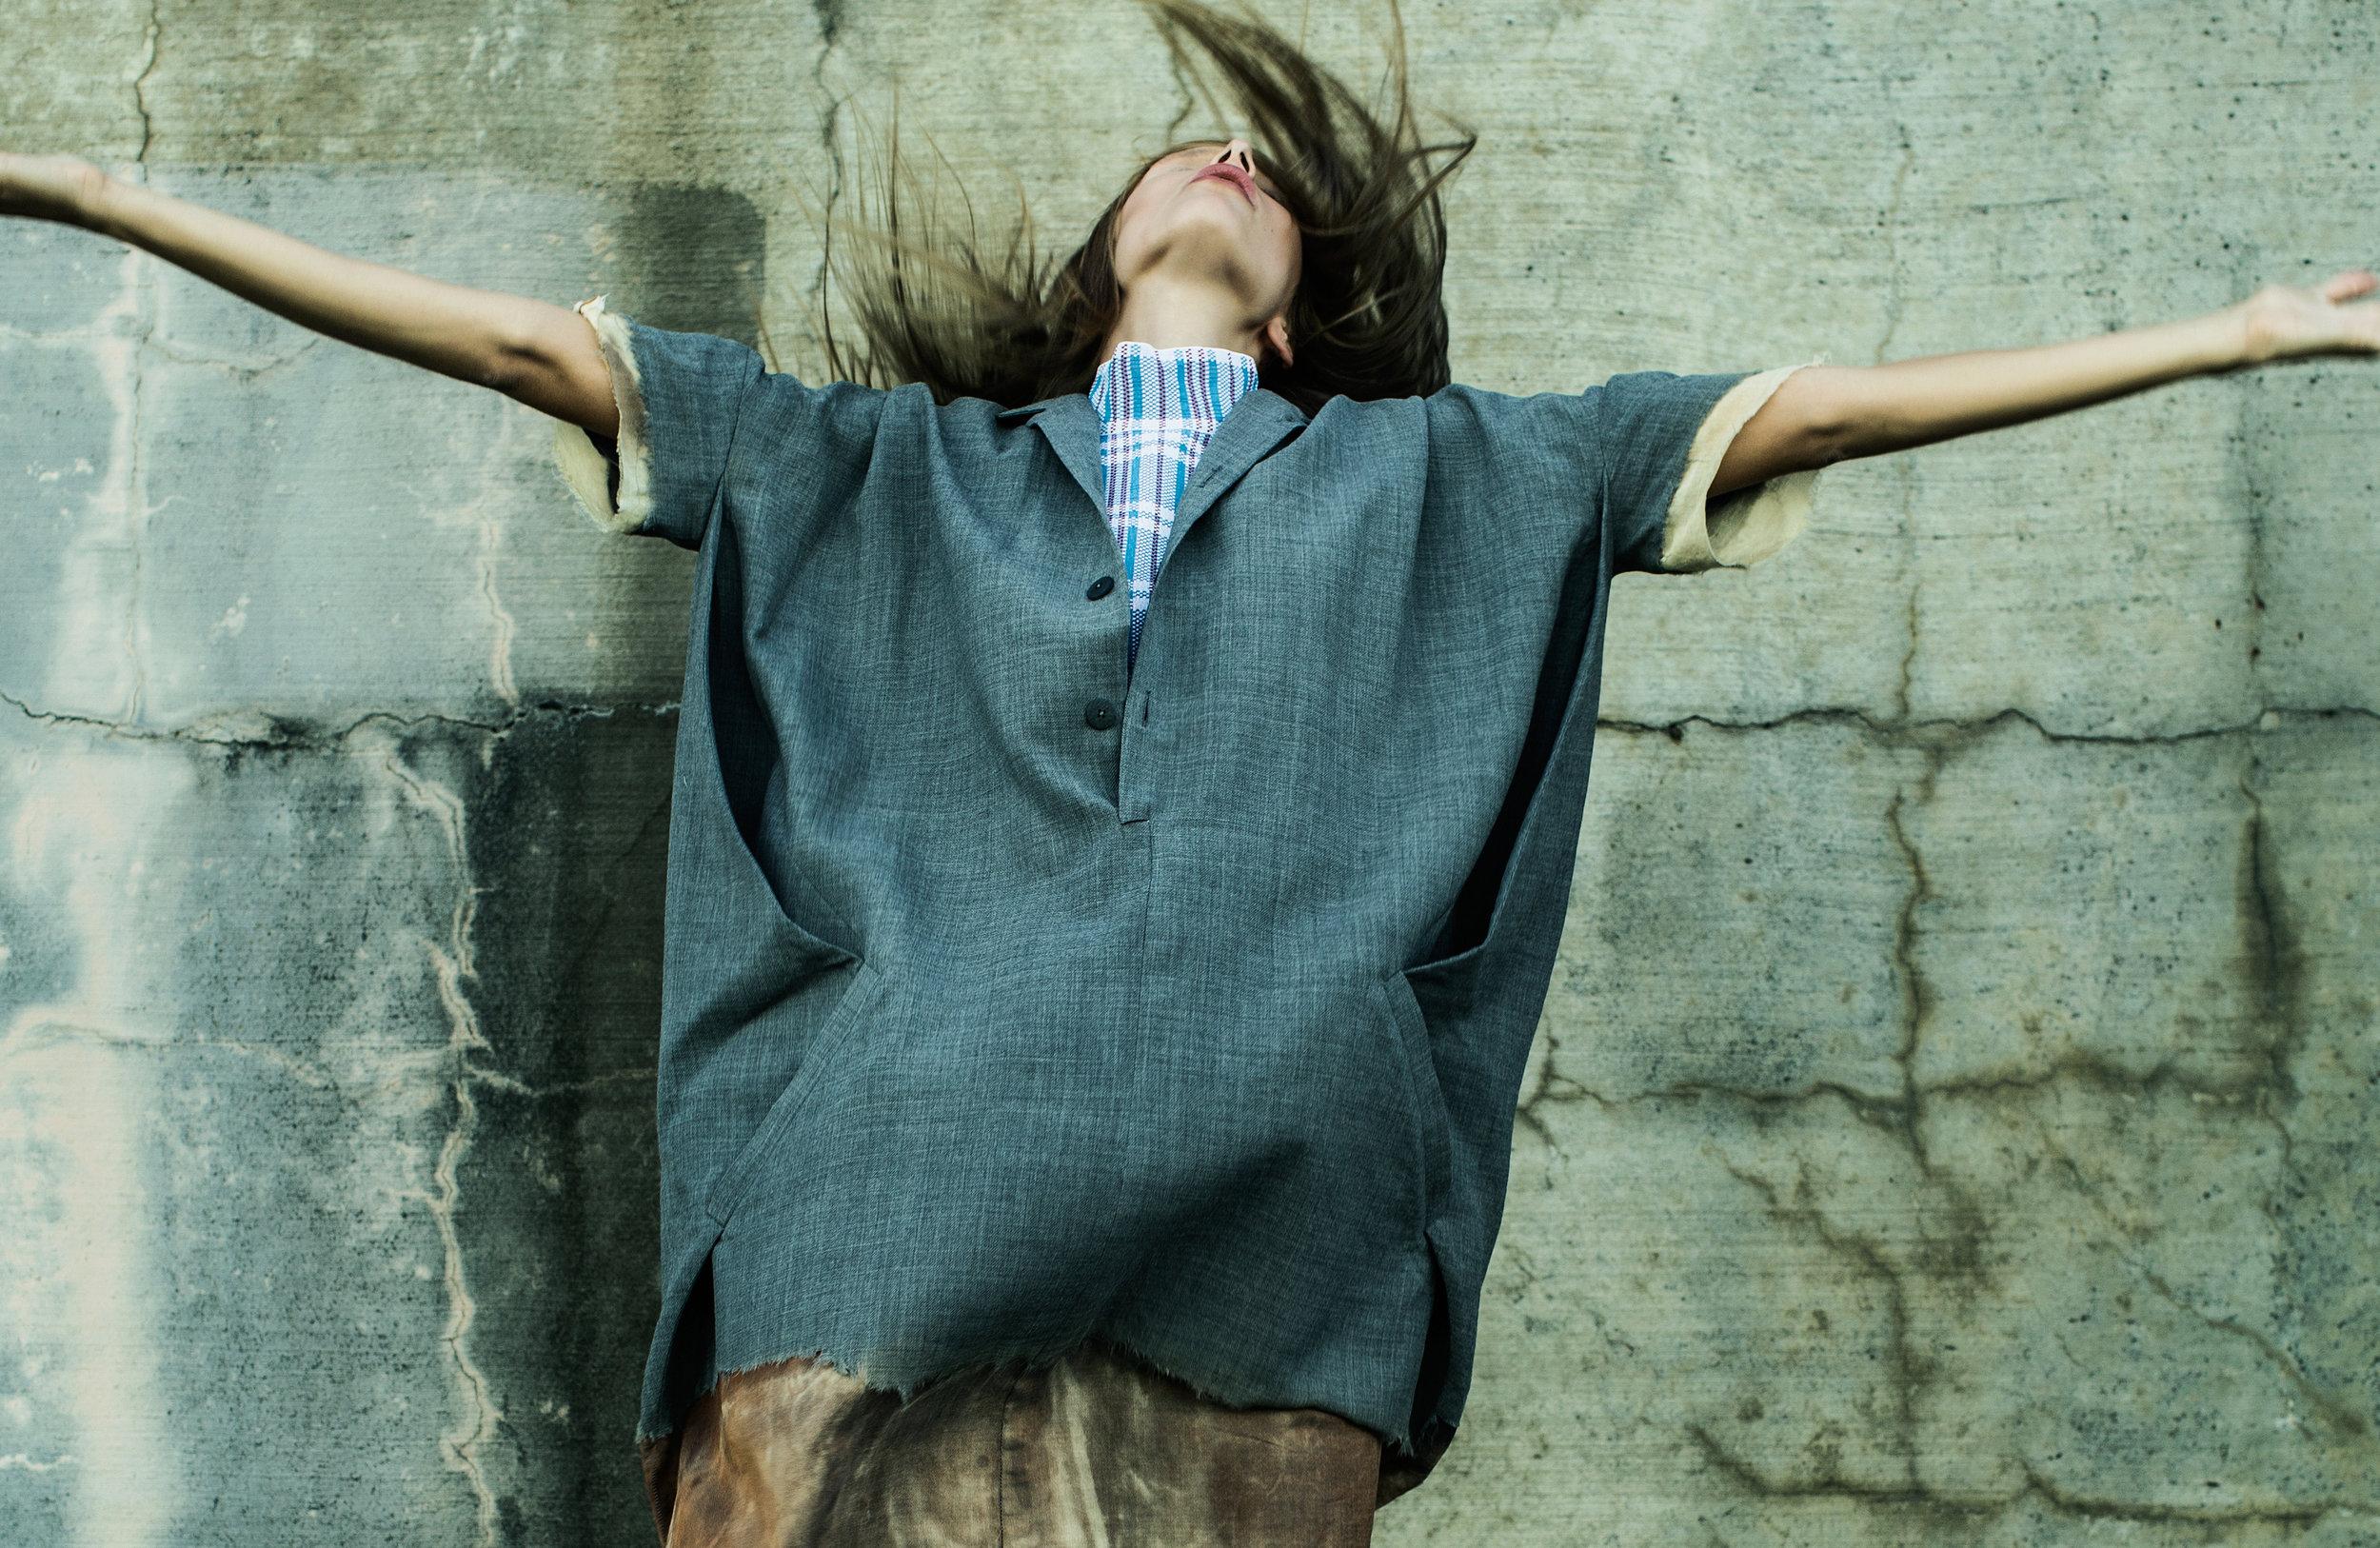 Dress by Gwen Shih-Yao Lai, MFA Fashion Design. Sweater, Céline, Saks Fifth Avenue.